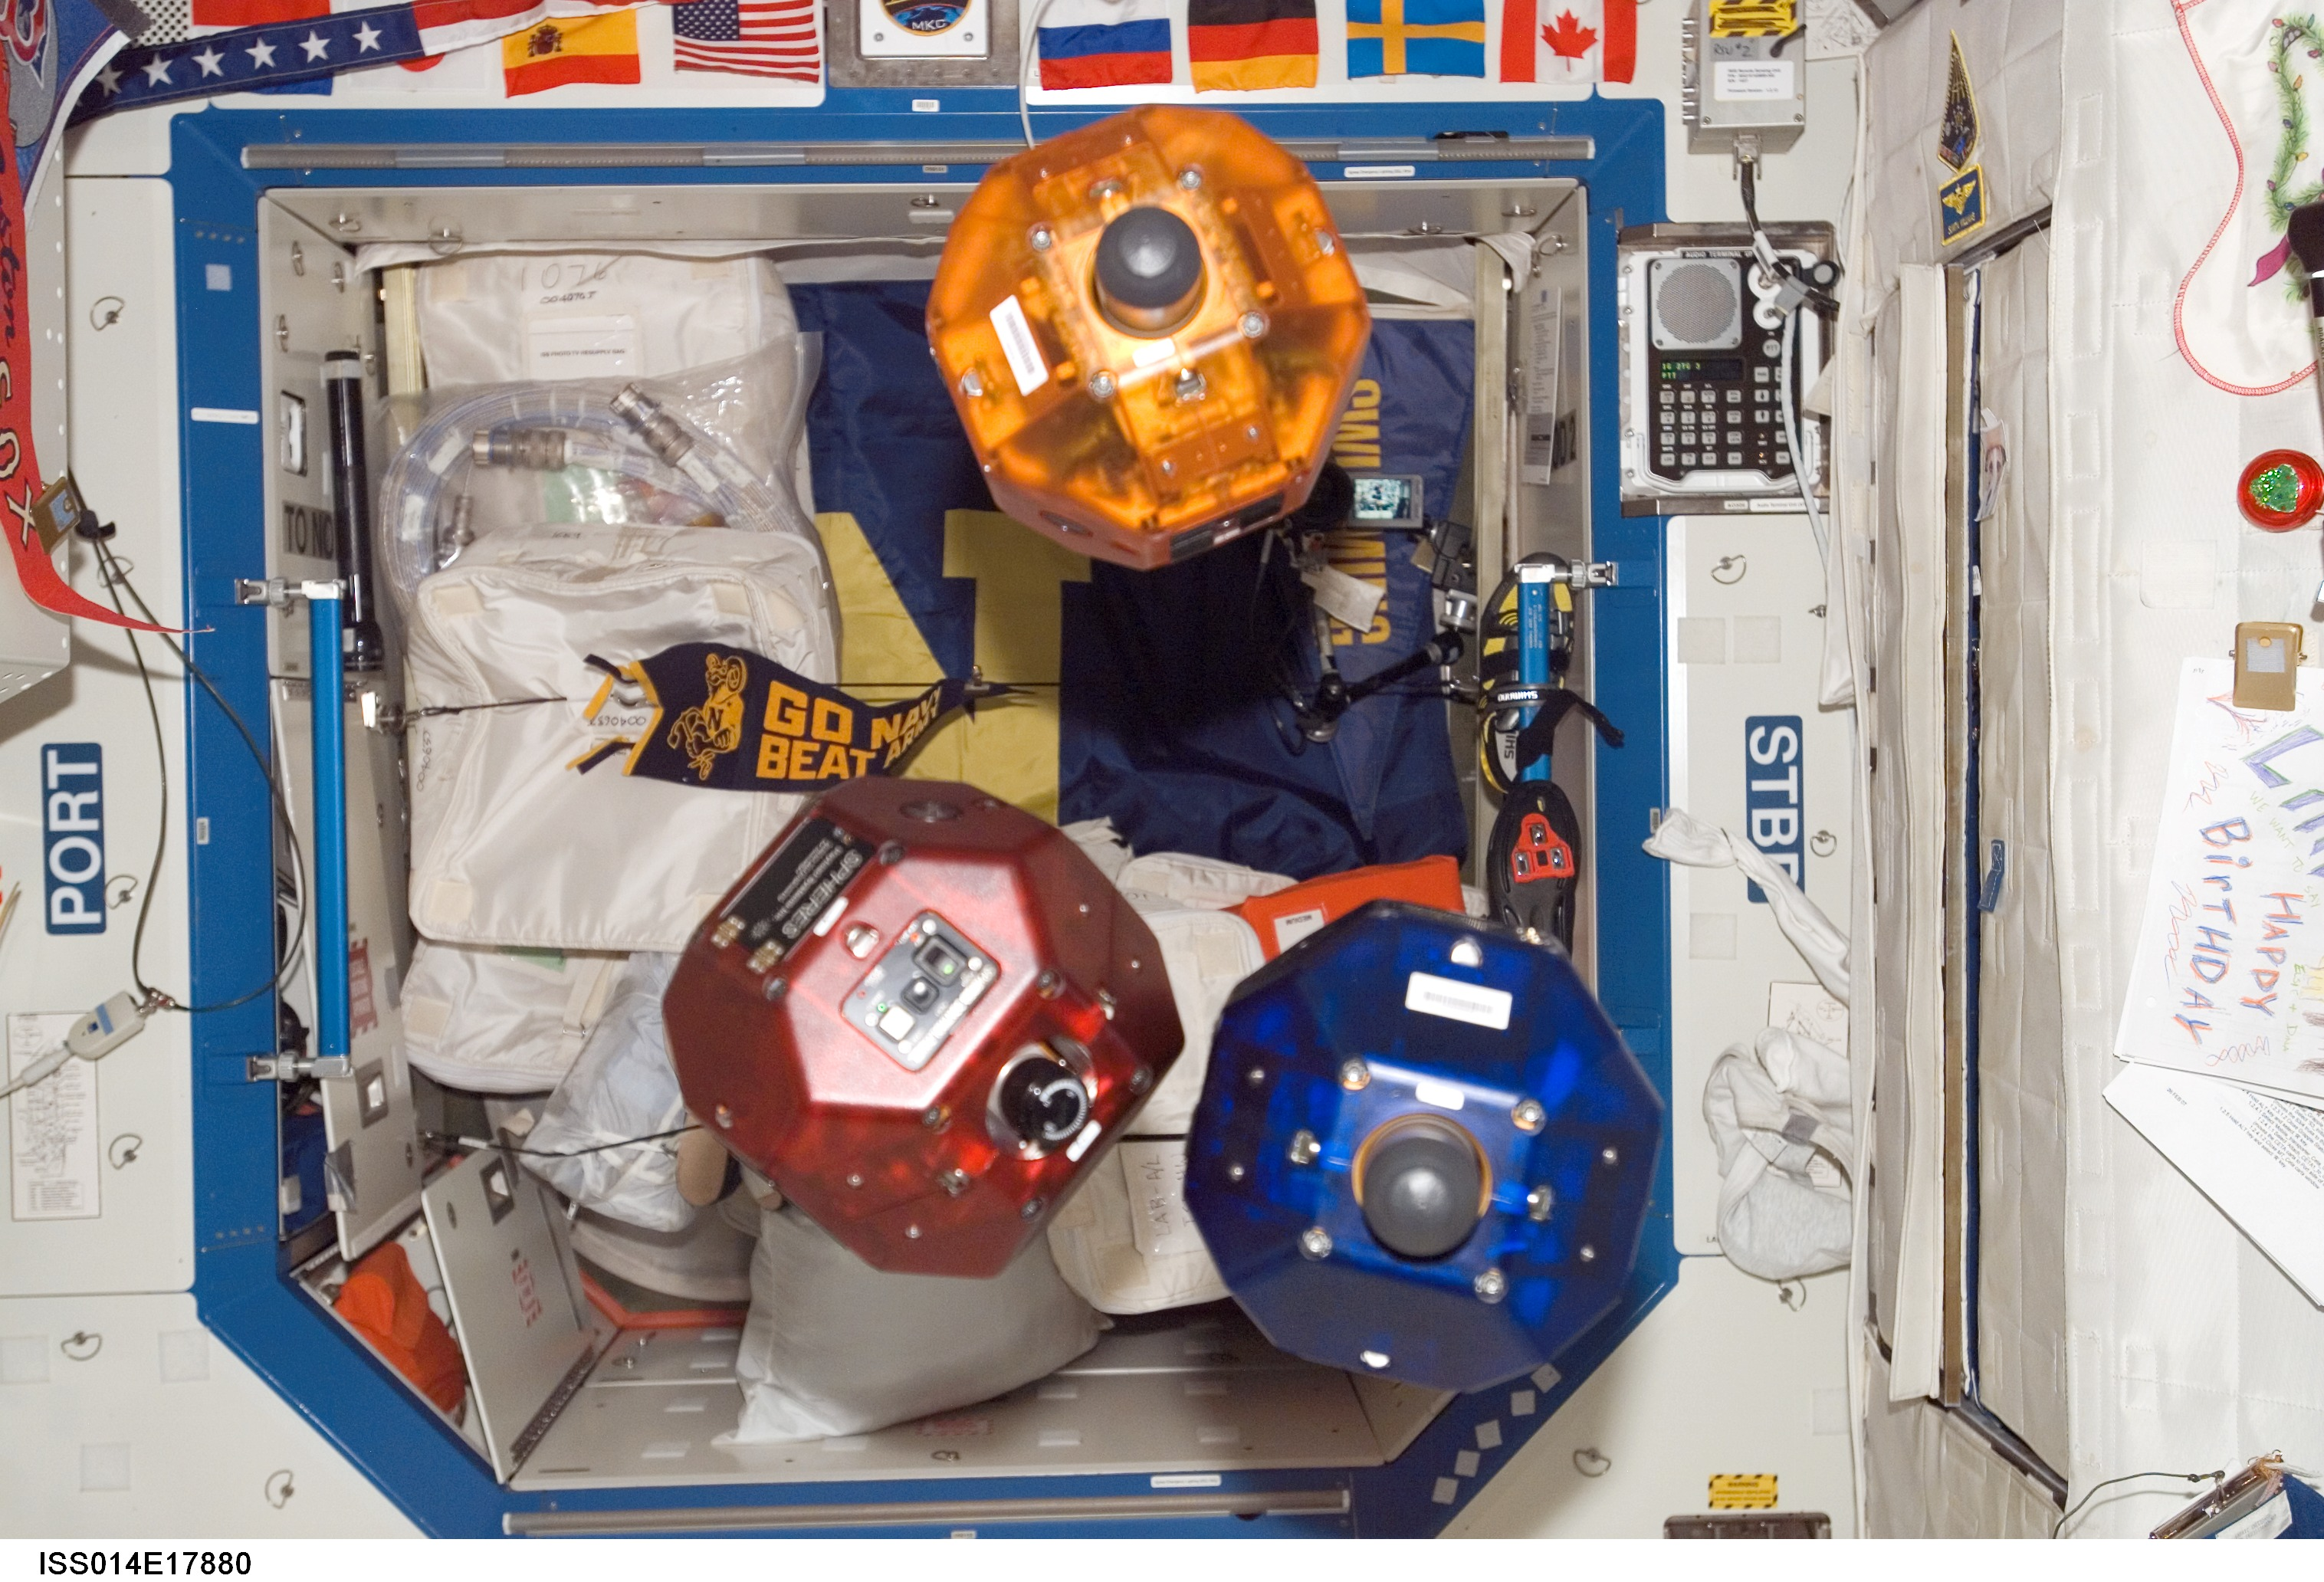 NASA - The SPHERES Experiment